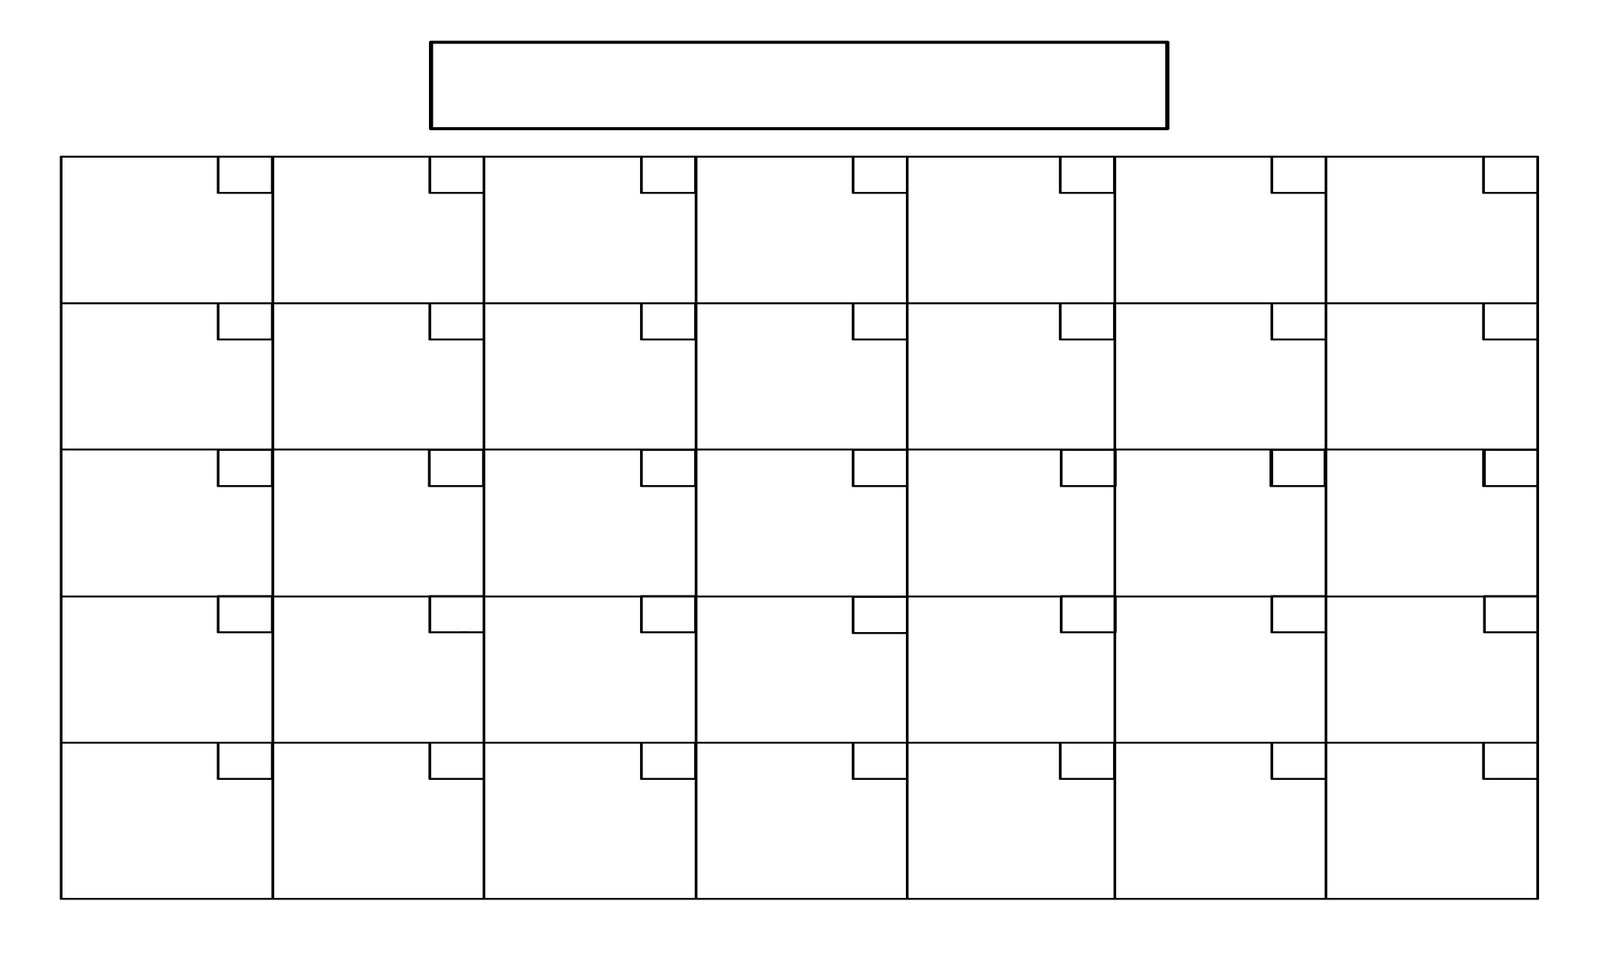 Printable Blank 31 Day Calendar | Template Calendar Printable in Printable Blank 31 Day Calendar